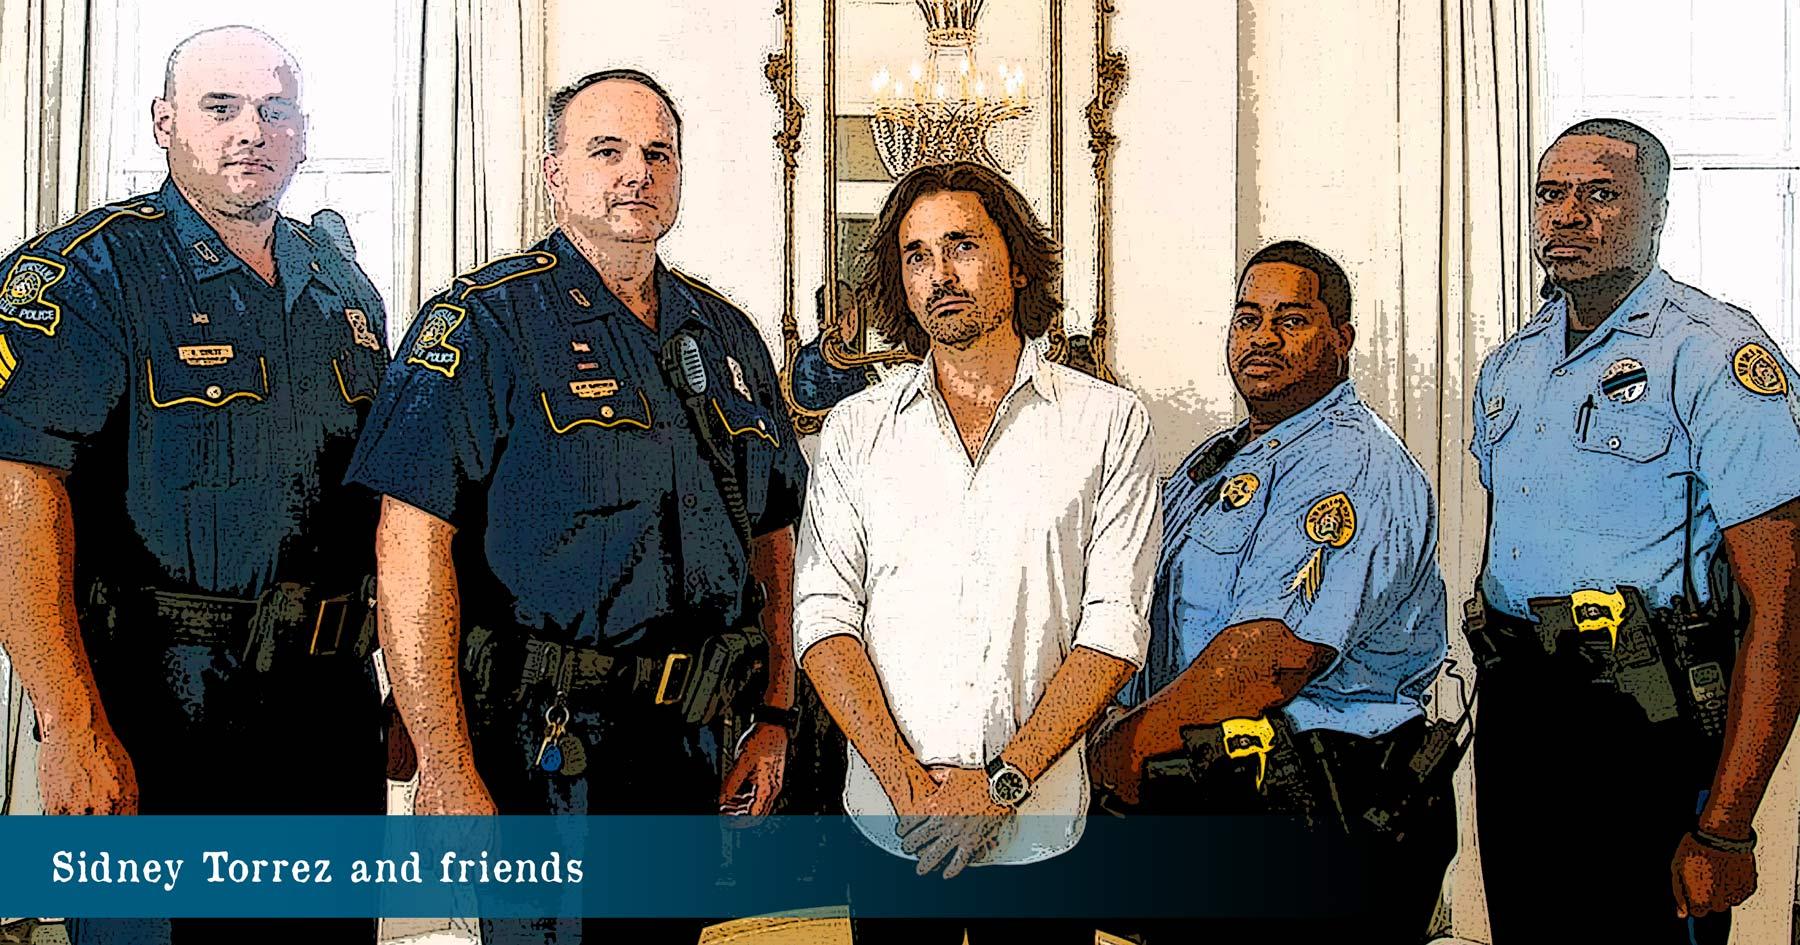 New Orleans, crime, police, Common Sense, illustration